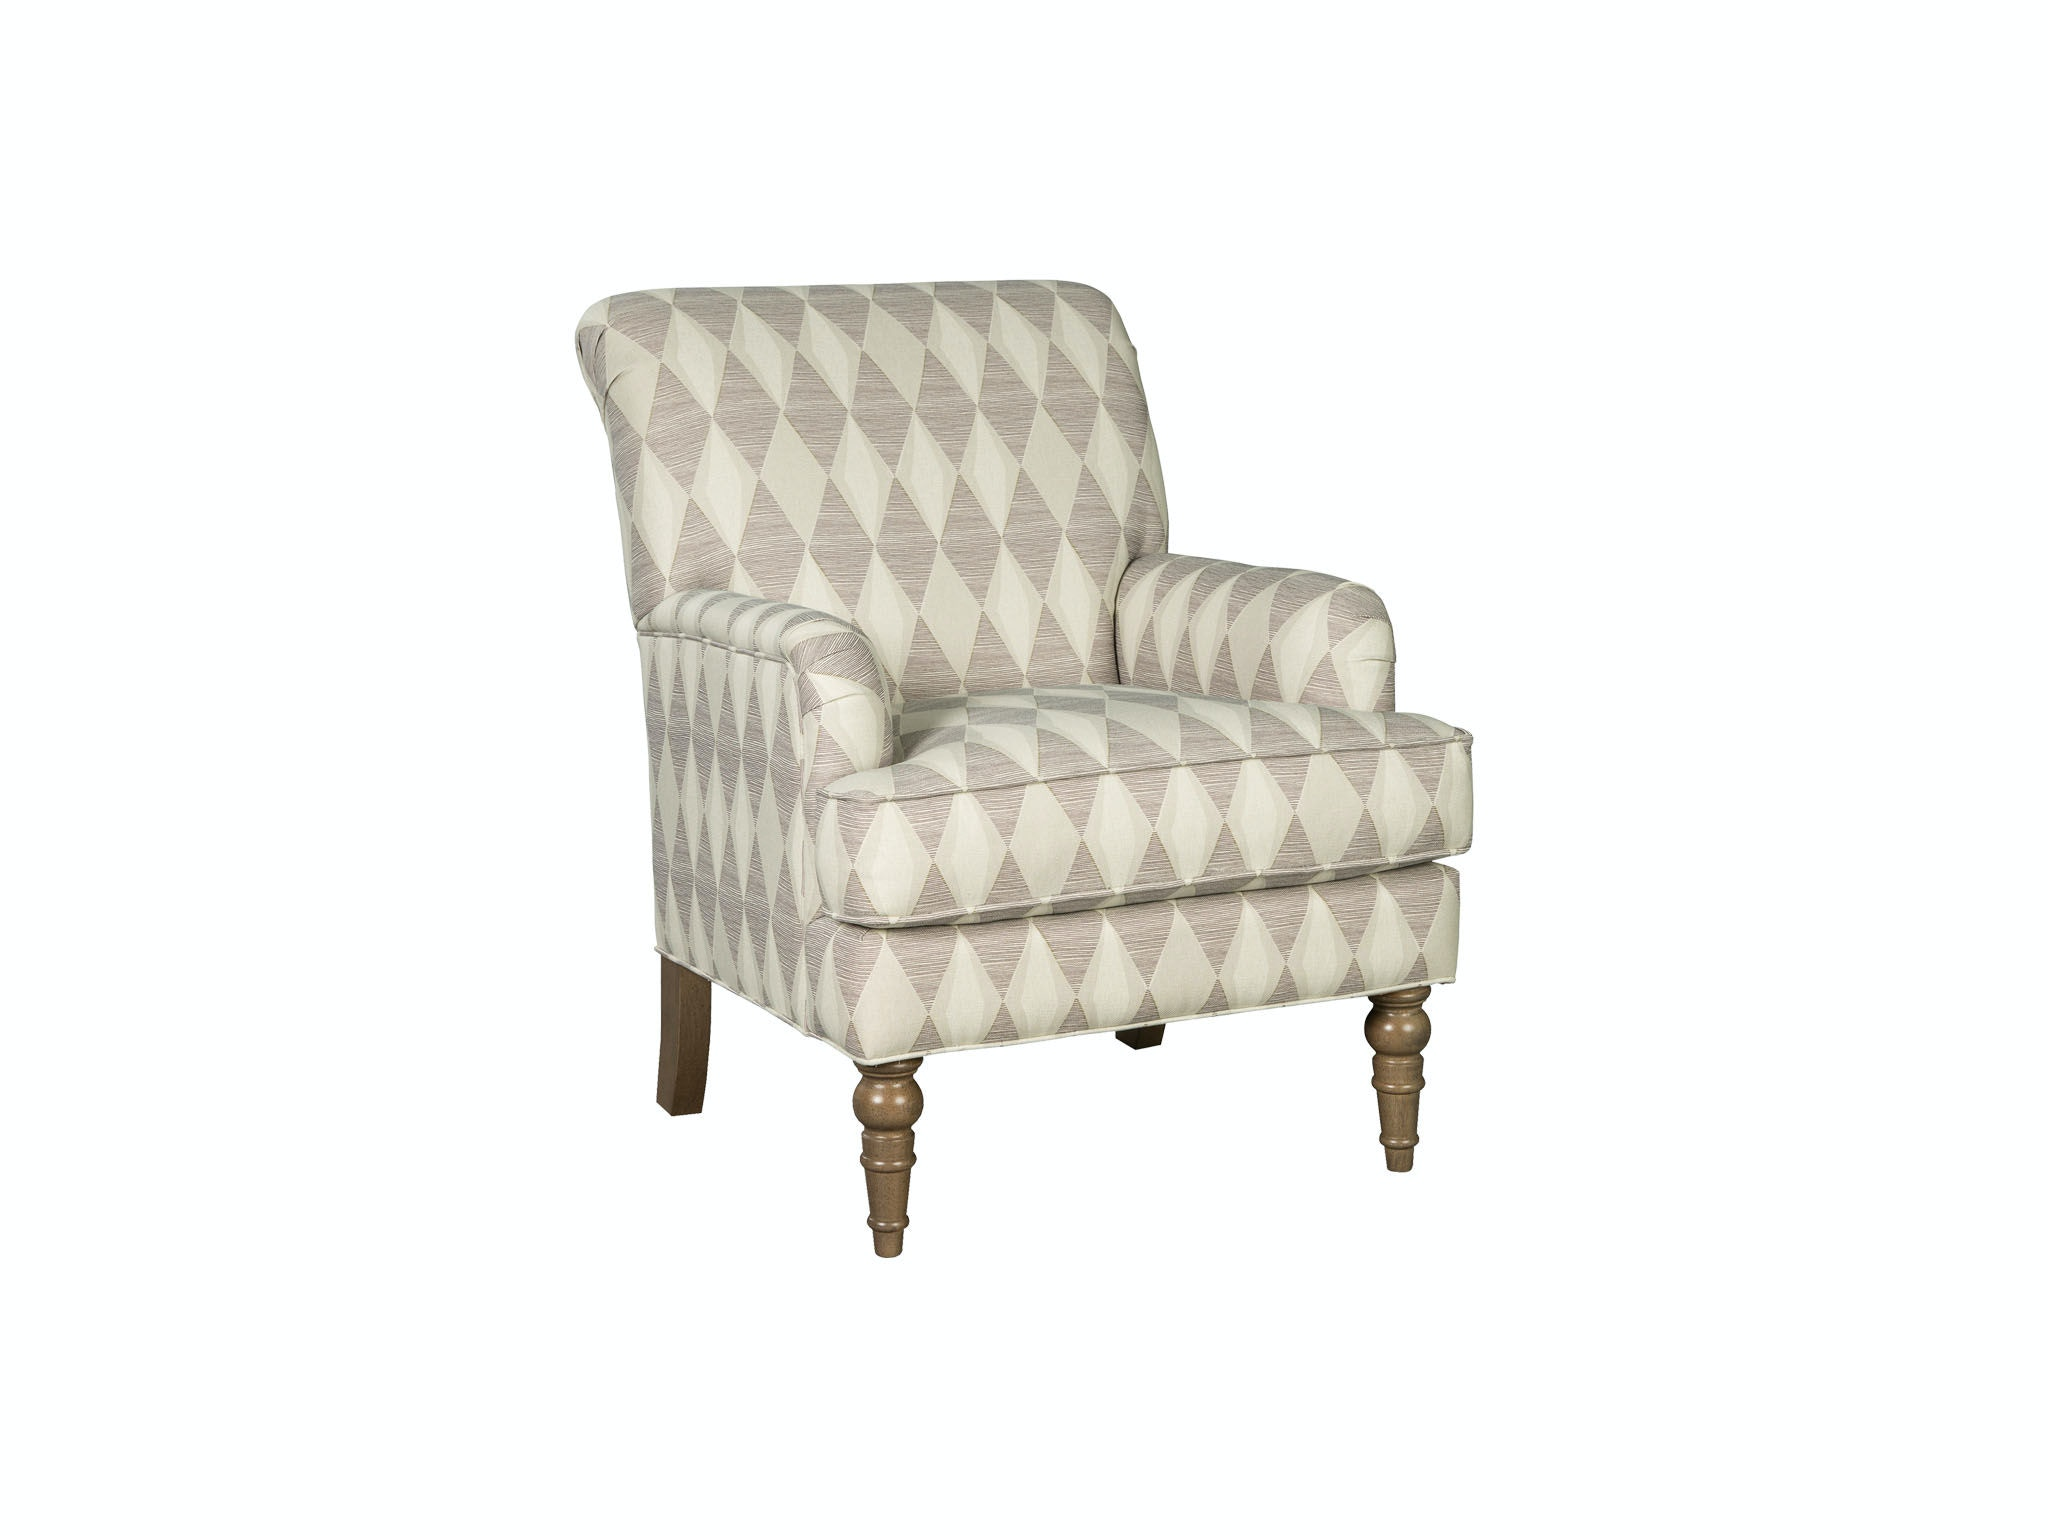 Paula Deen By Craftmaster Chair P081910BD